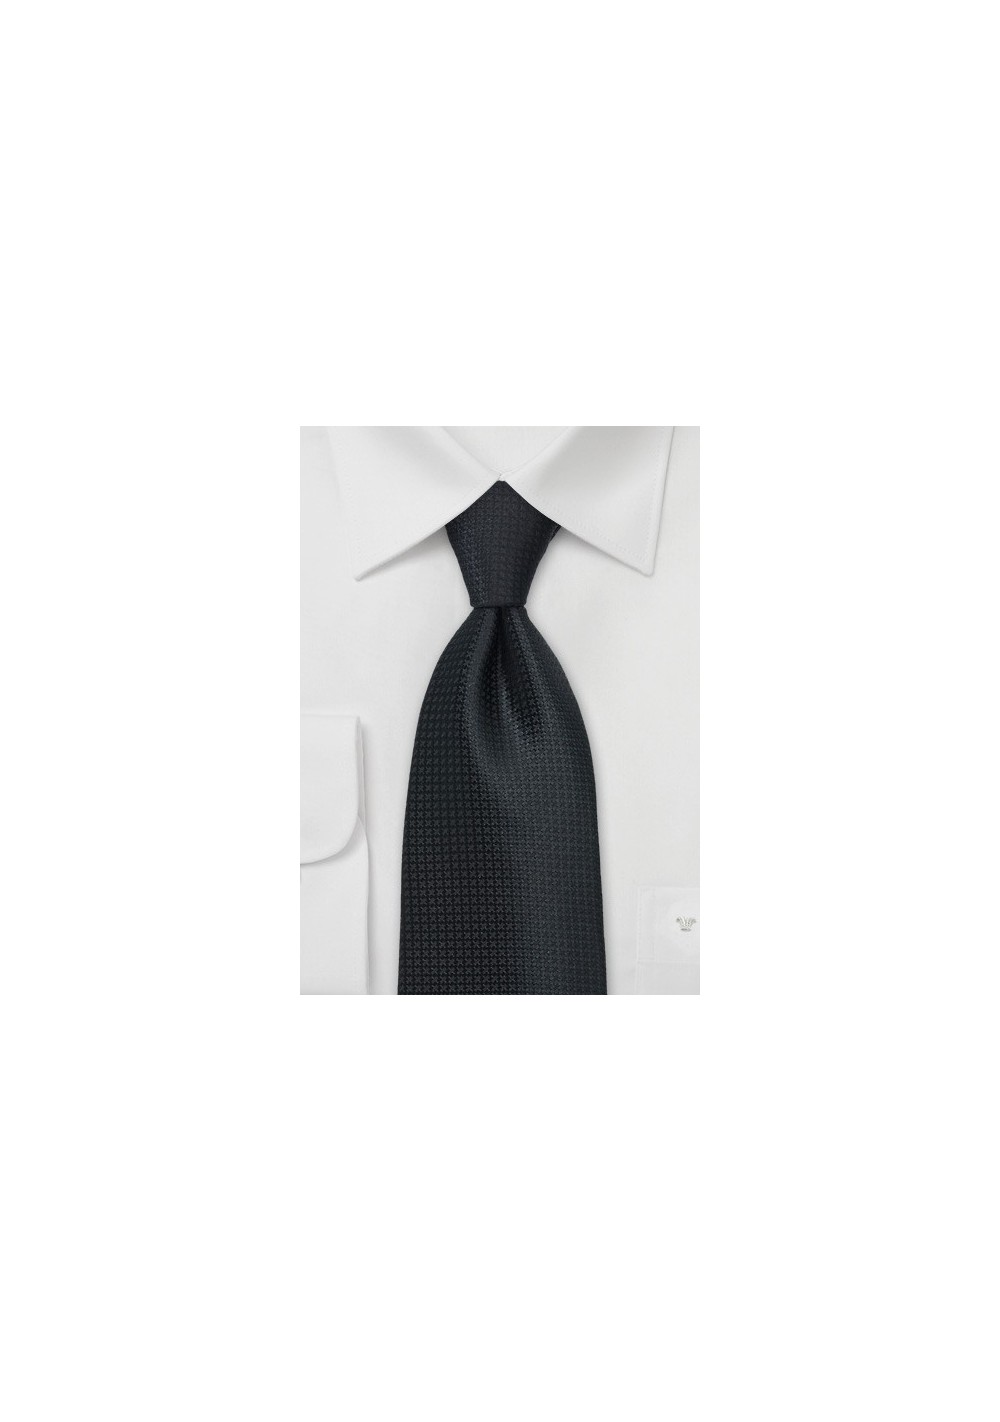 Textured Black Tie